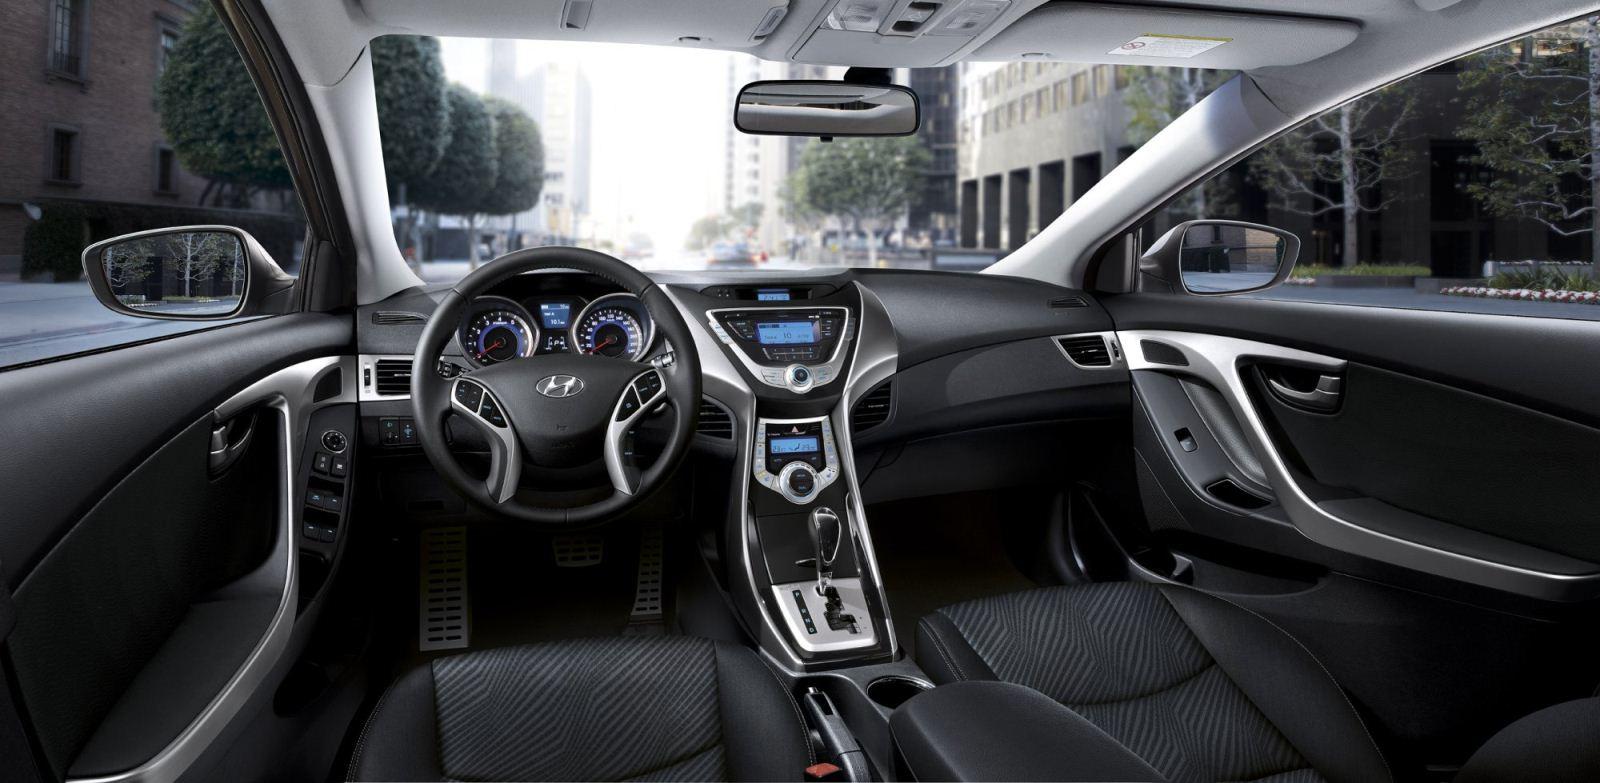 Hyundai Elantra İç Tasarım